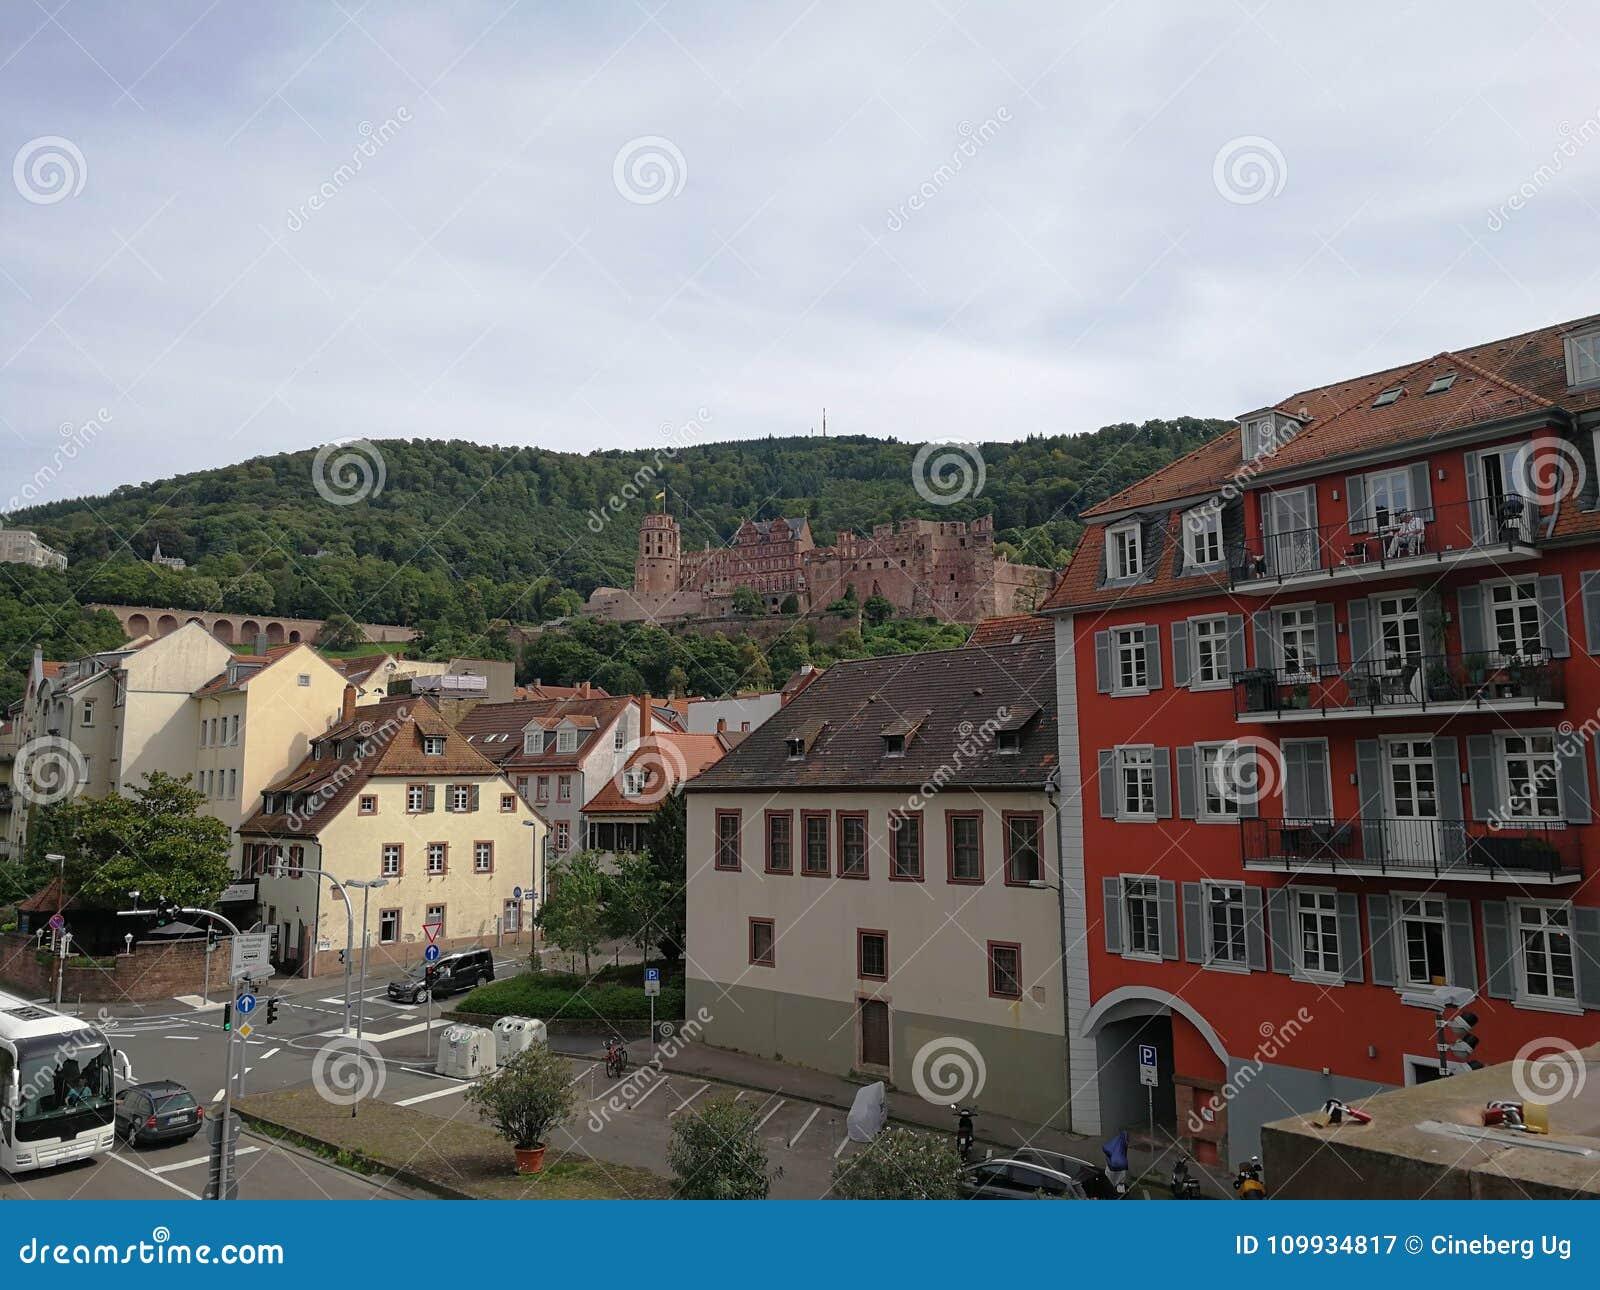 Heidelberger Schloss, kasteel van Heidelberg, Duitsland